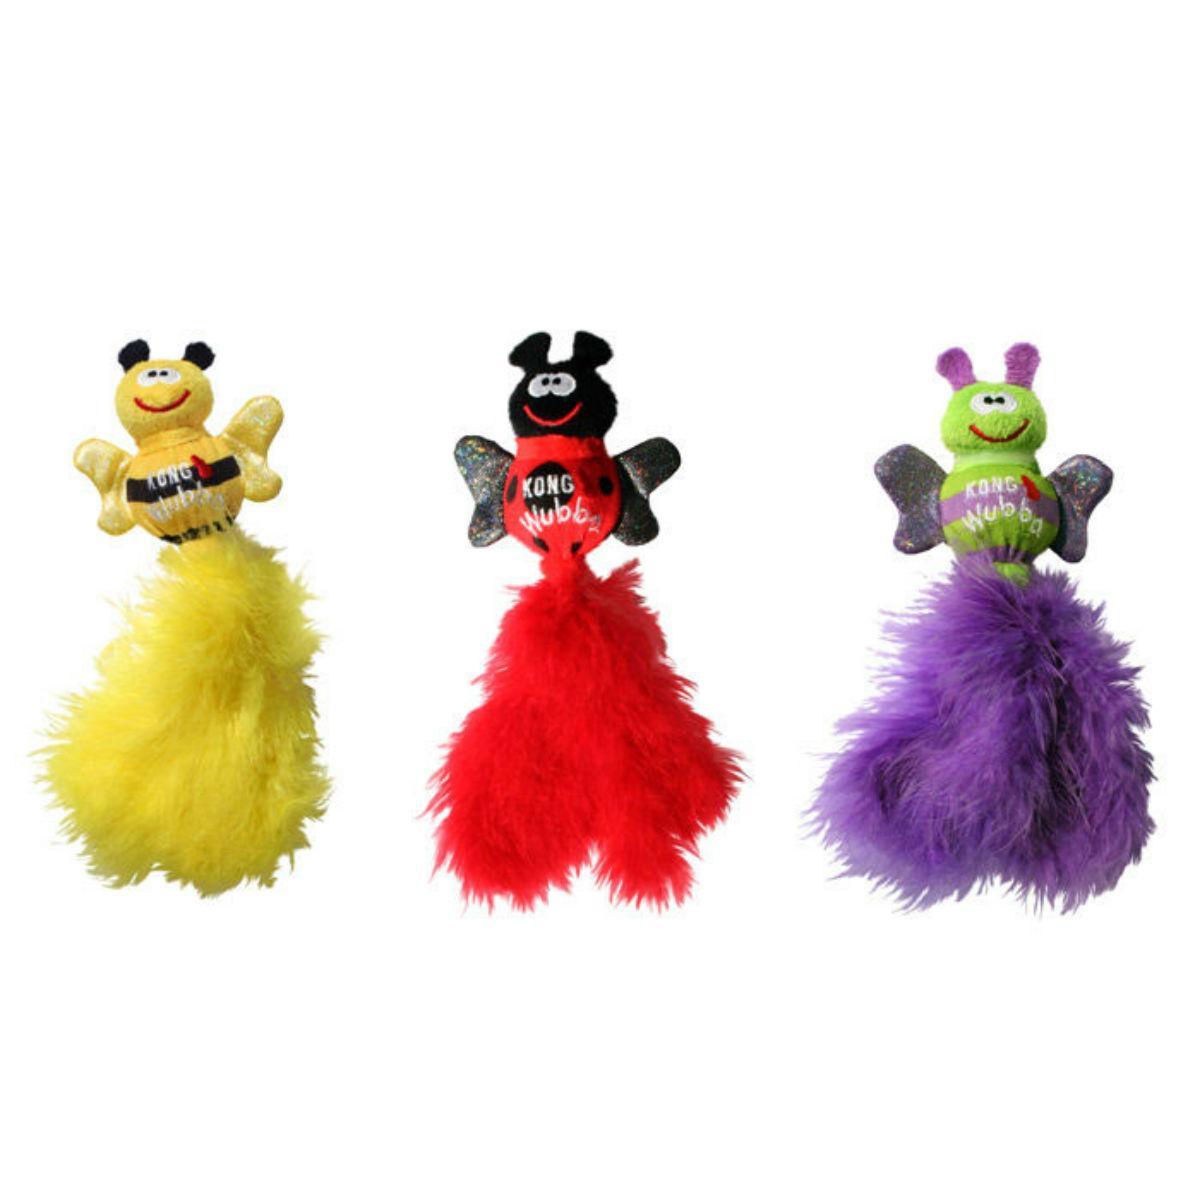 KONG Wubba Cat Toy - Bug